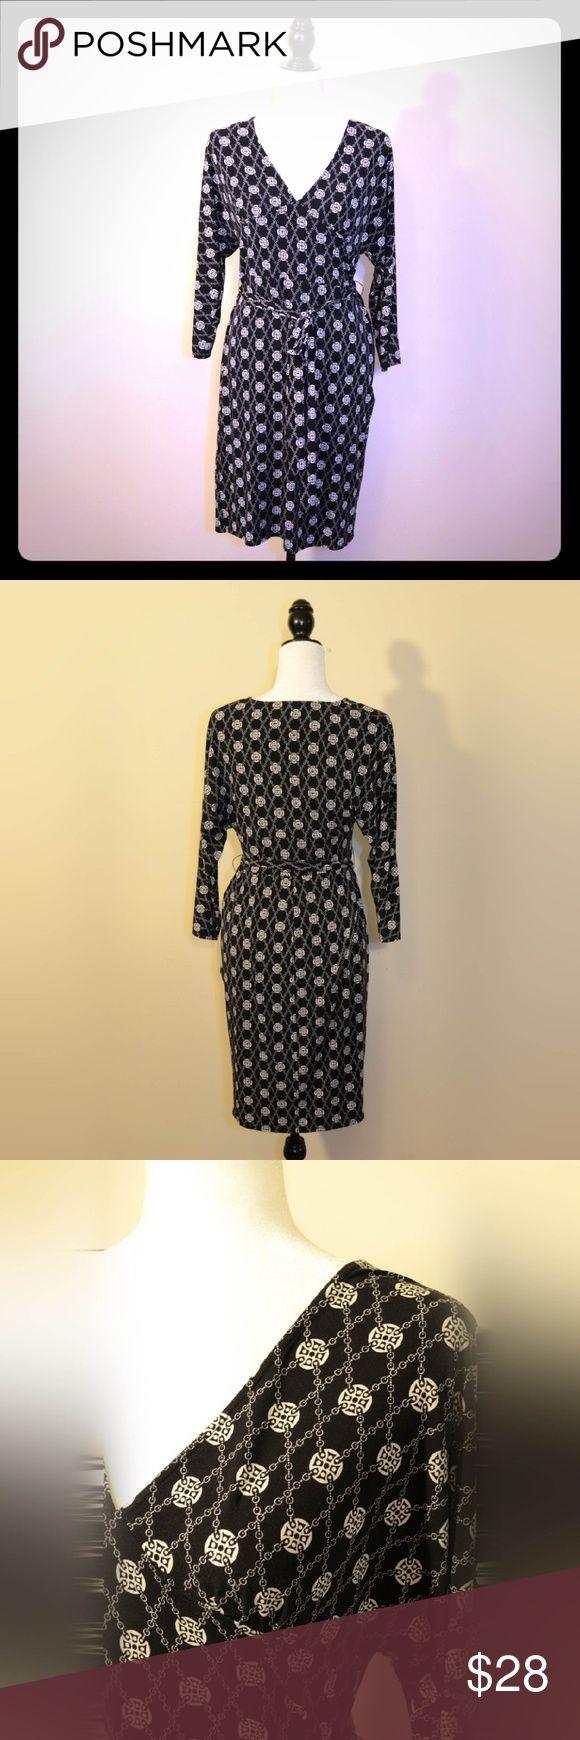 Black & White Dress - Laundry by Shelli Segal Elegant black and white patterned long sleeve dress by Laundry by Shelli Segal. Laundry by Shelli Segal Dresses Long Sleeve